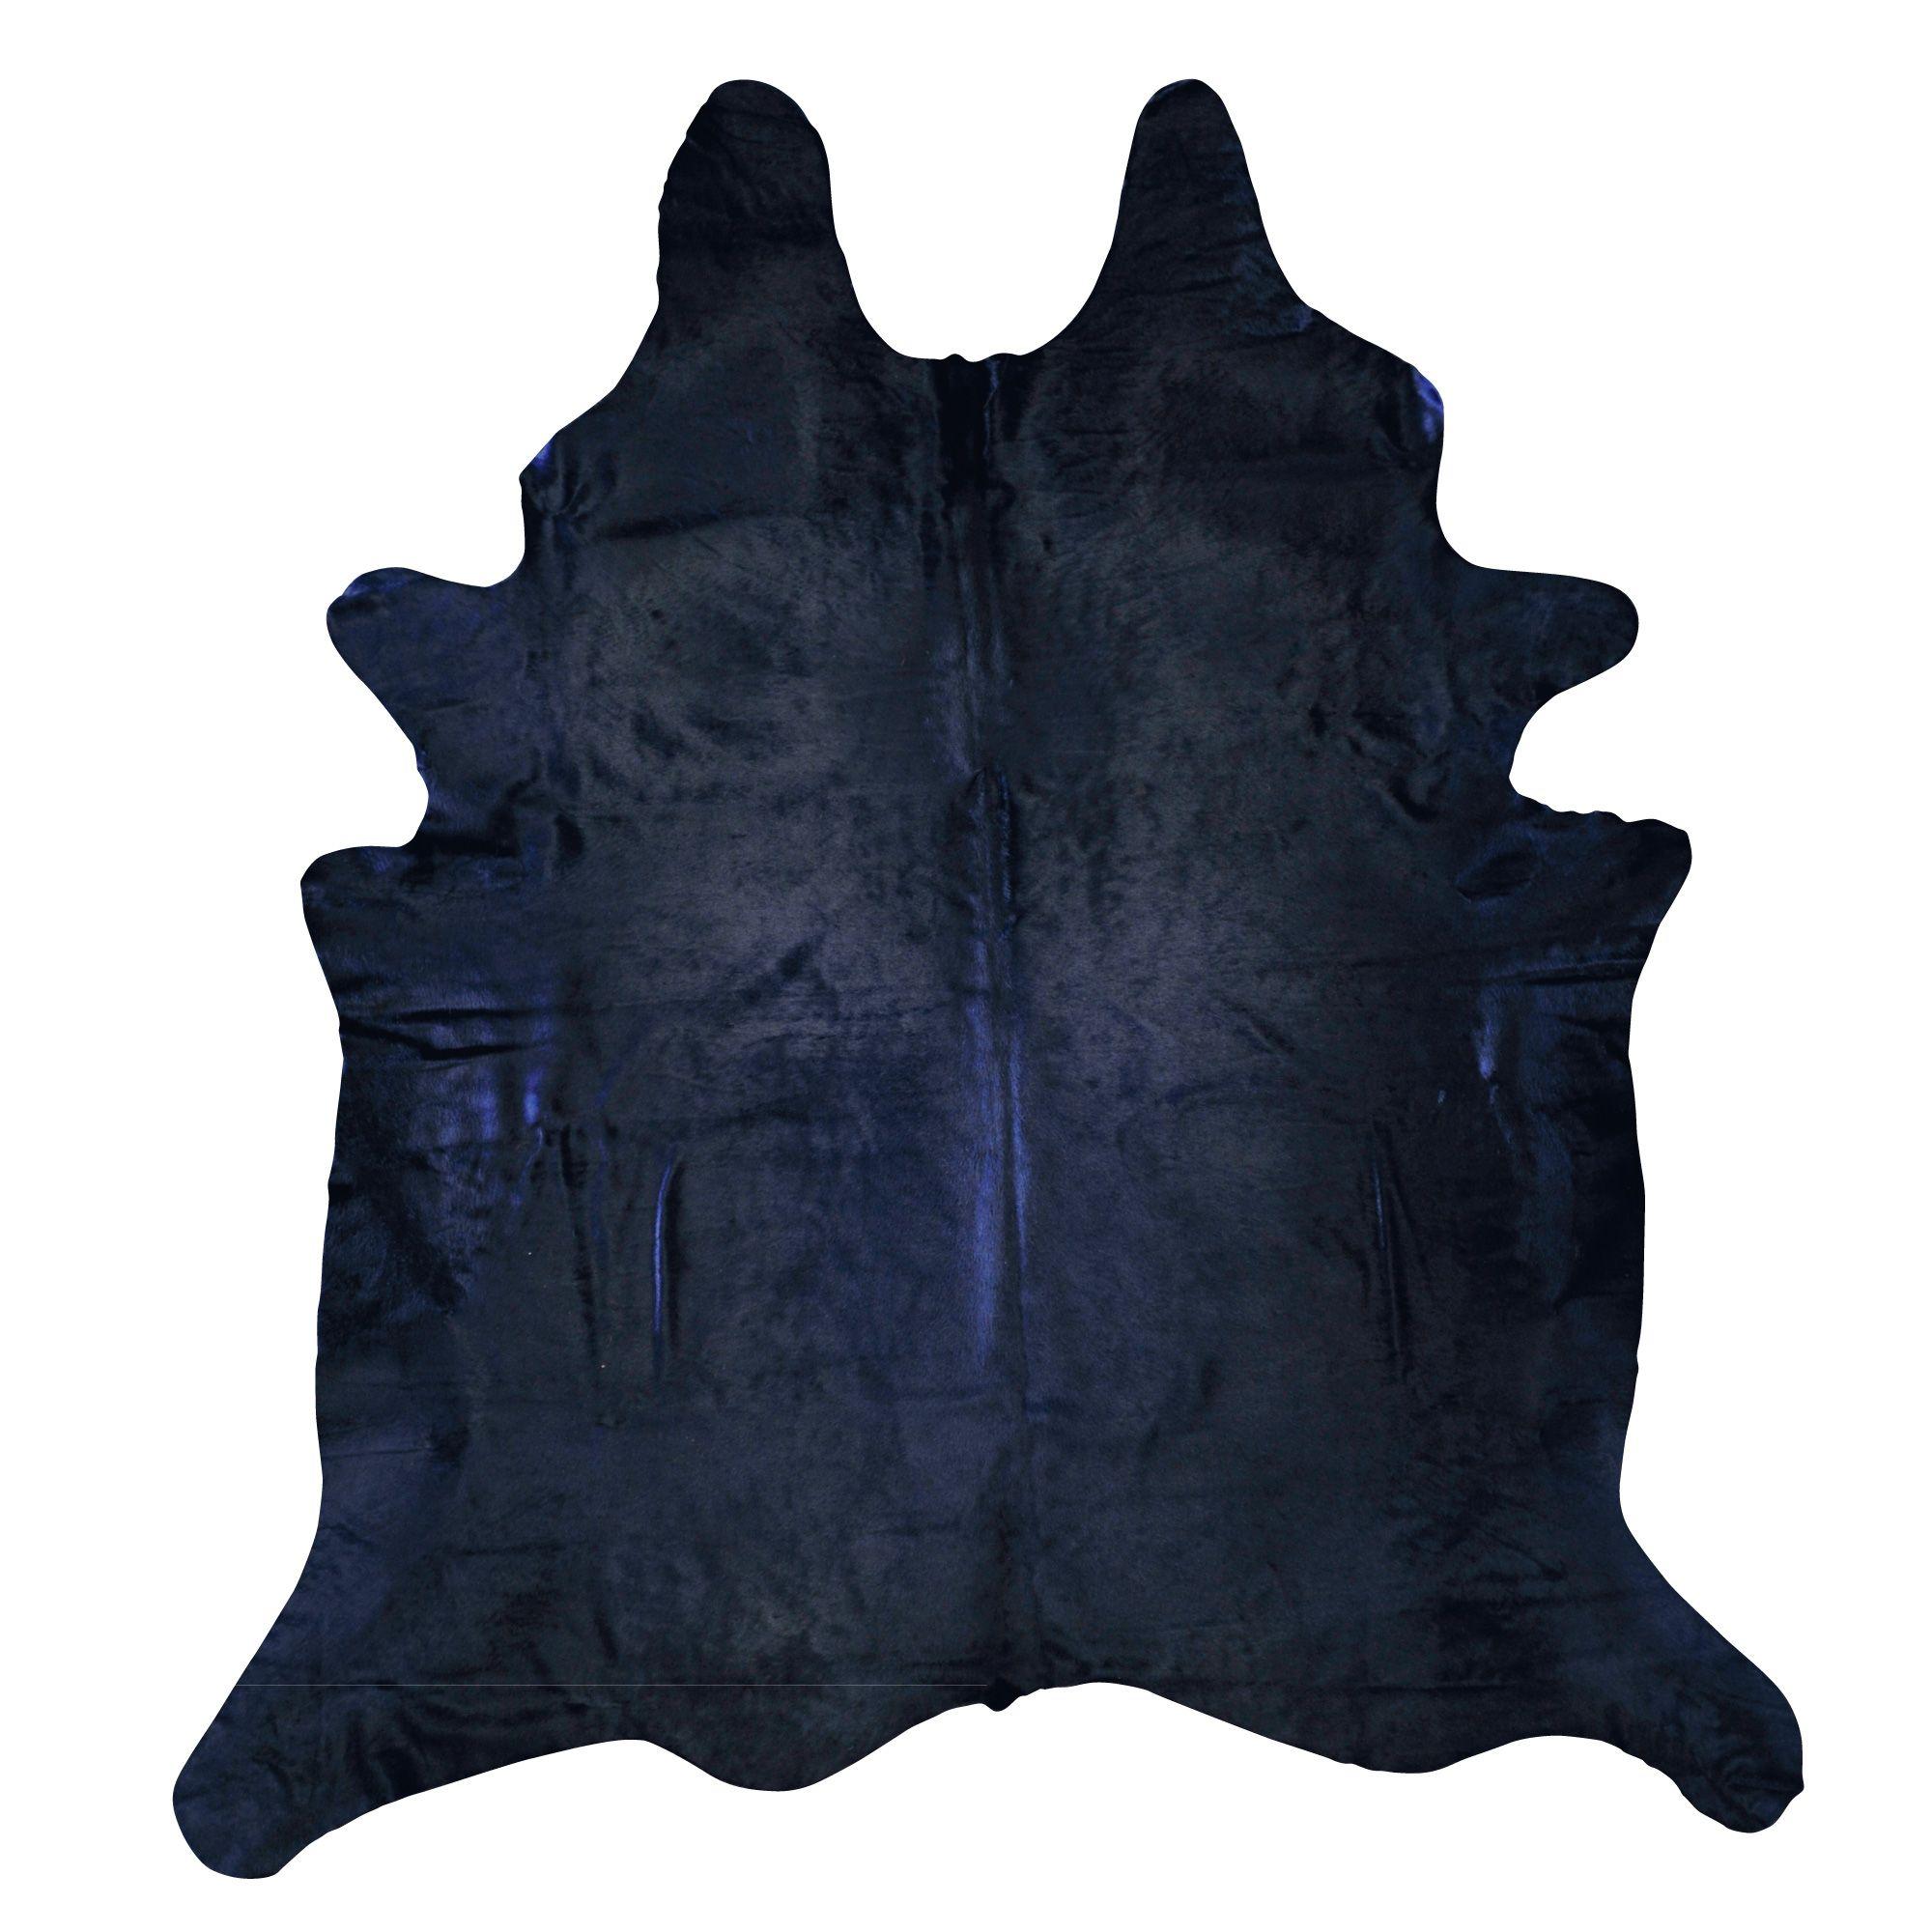 Navy Blue Cowhide Rug For Oscar S Bedroom